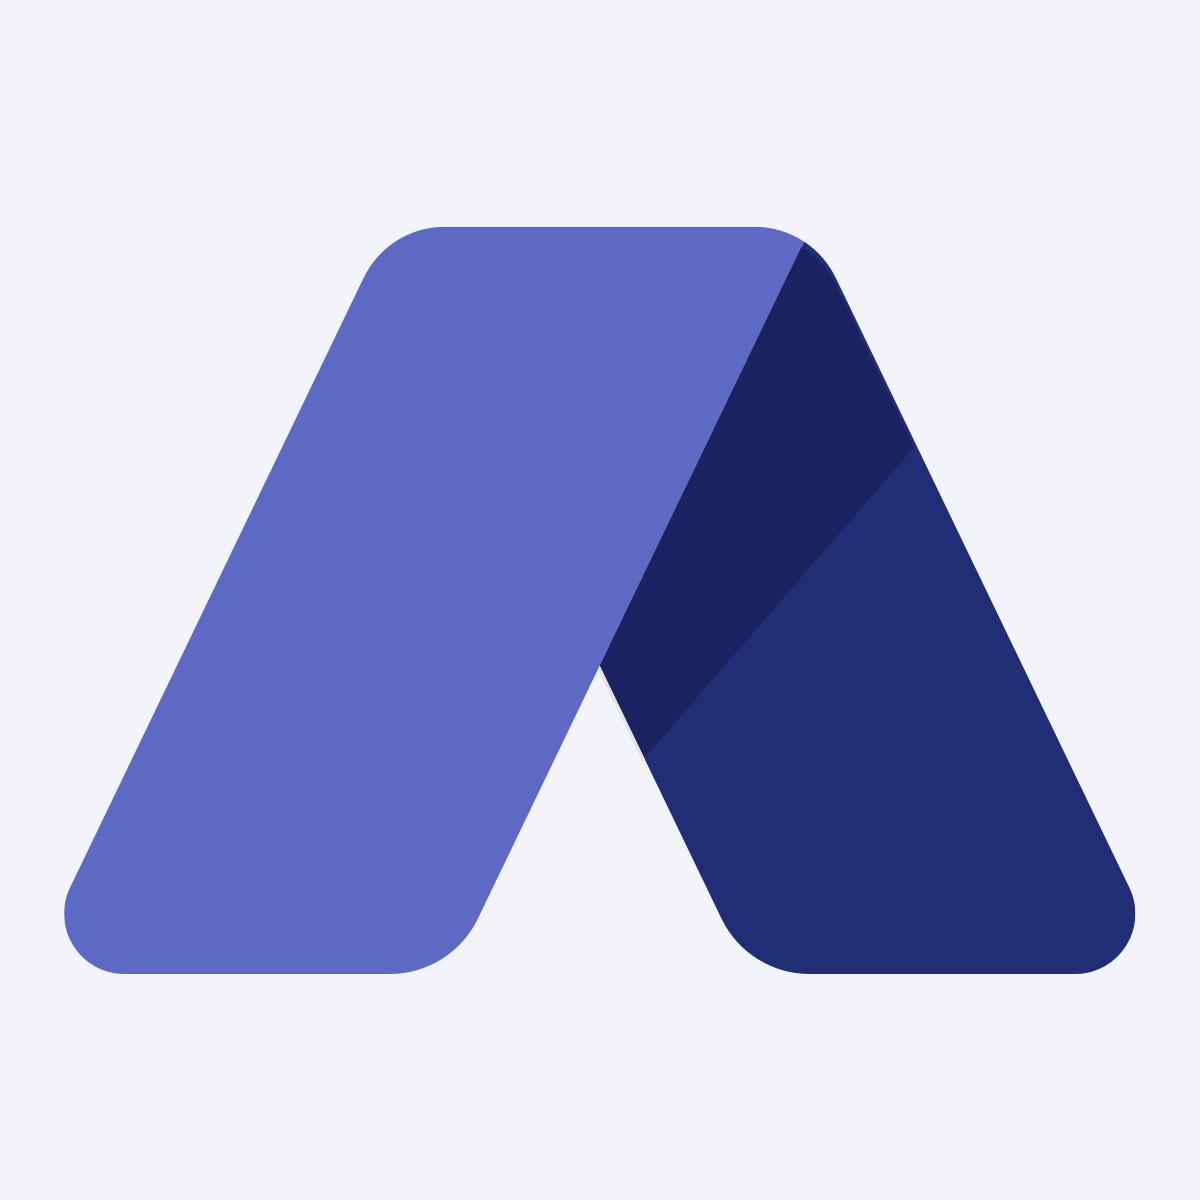 Shopify Customer Fields app by Accentuate digital